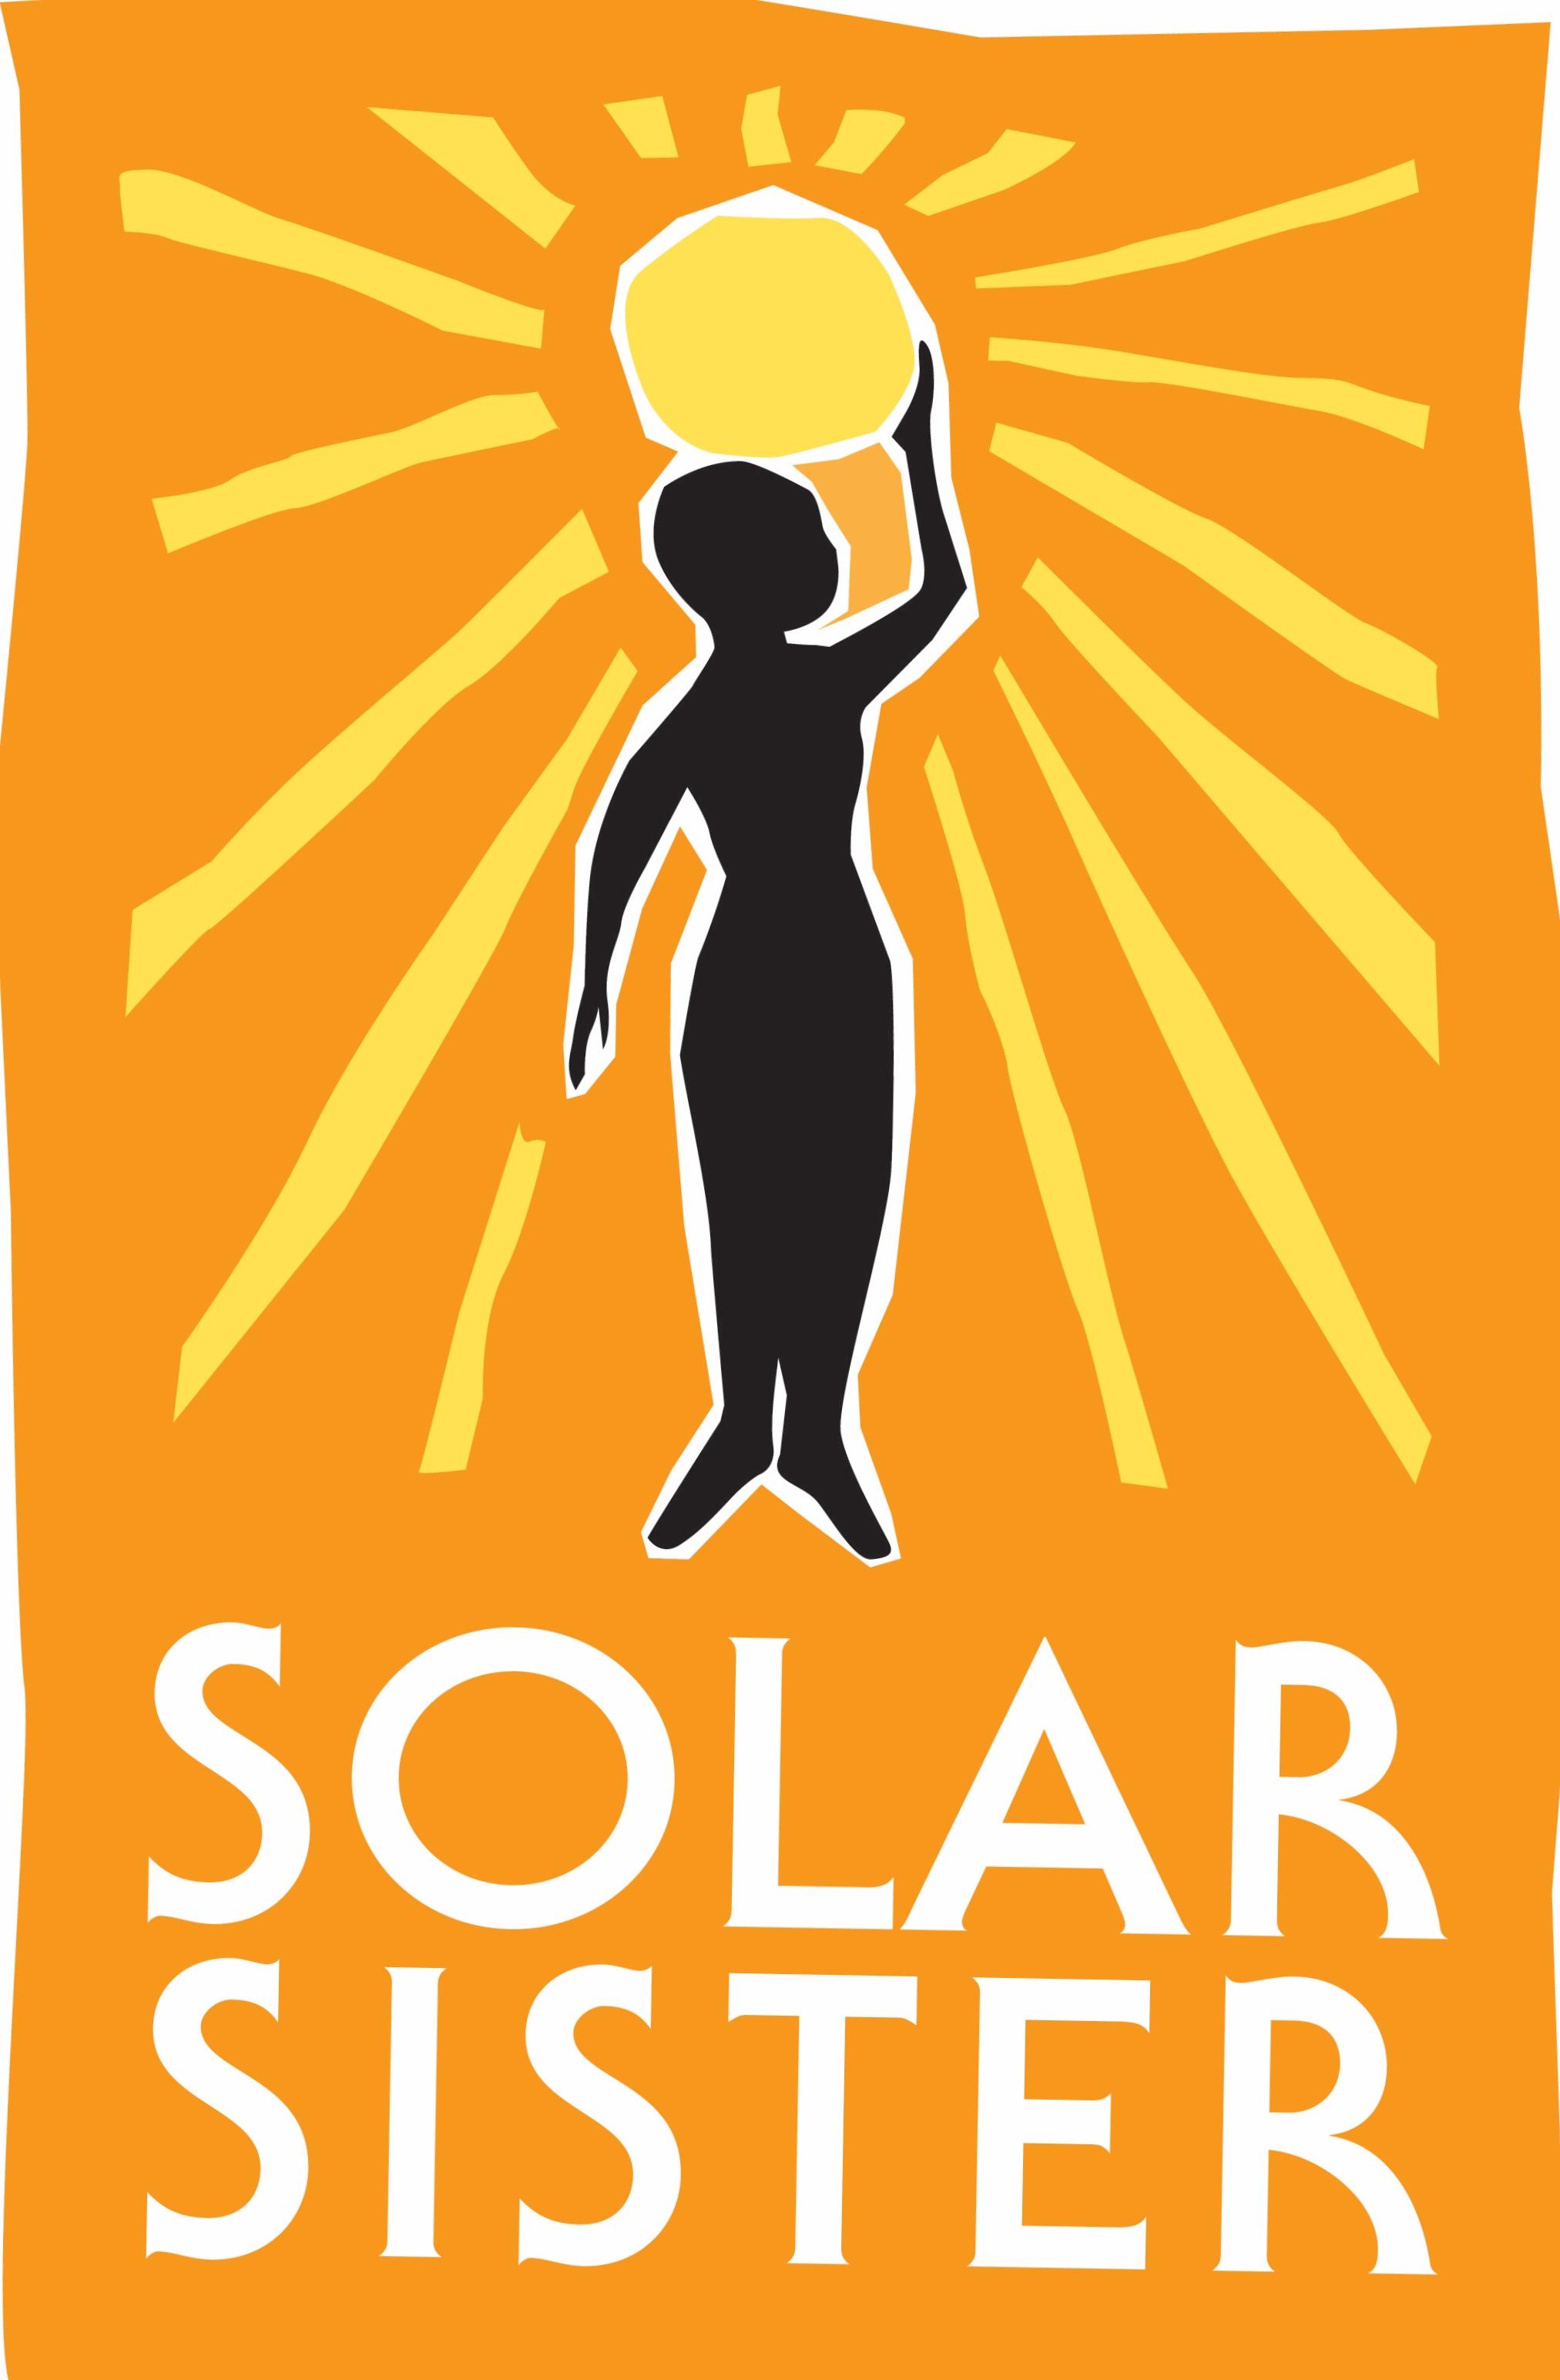 3.SolarSister_Vert_LOGO.jpg